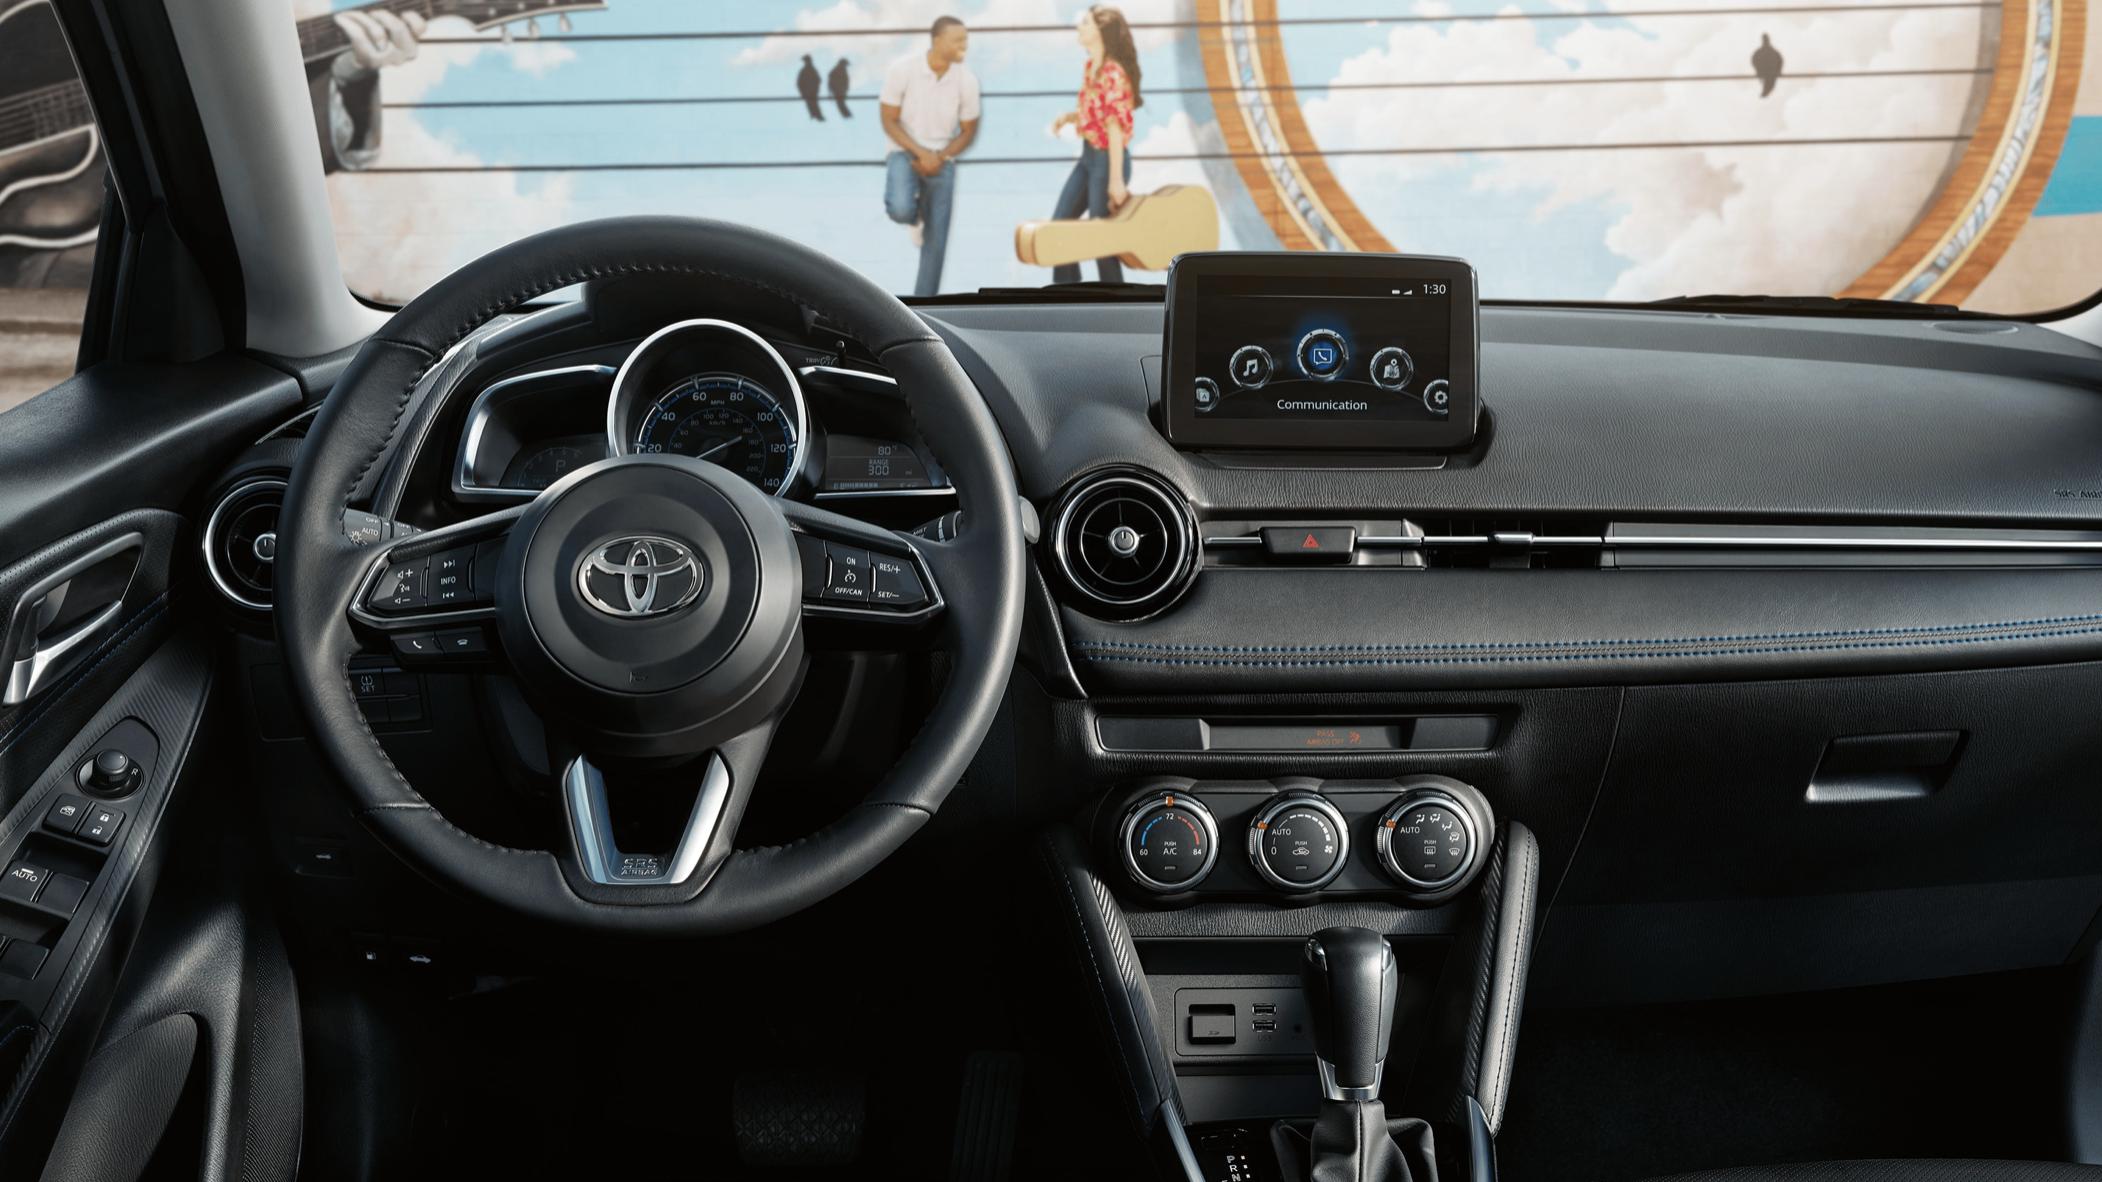 2020 Interior Of Toyota Yaris Car Sedan In 2020 Yaris Toyota Car Salesman